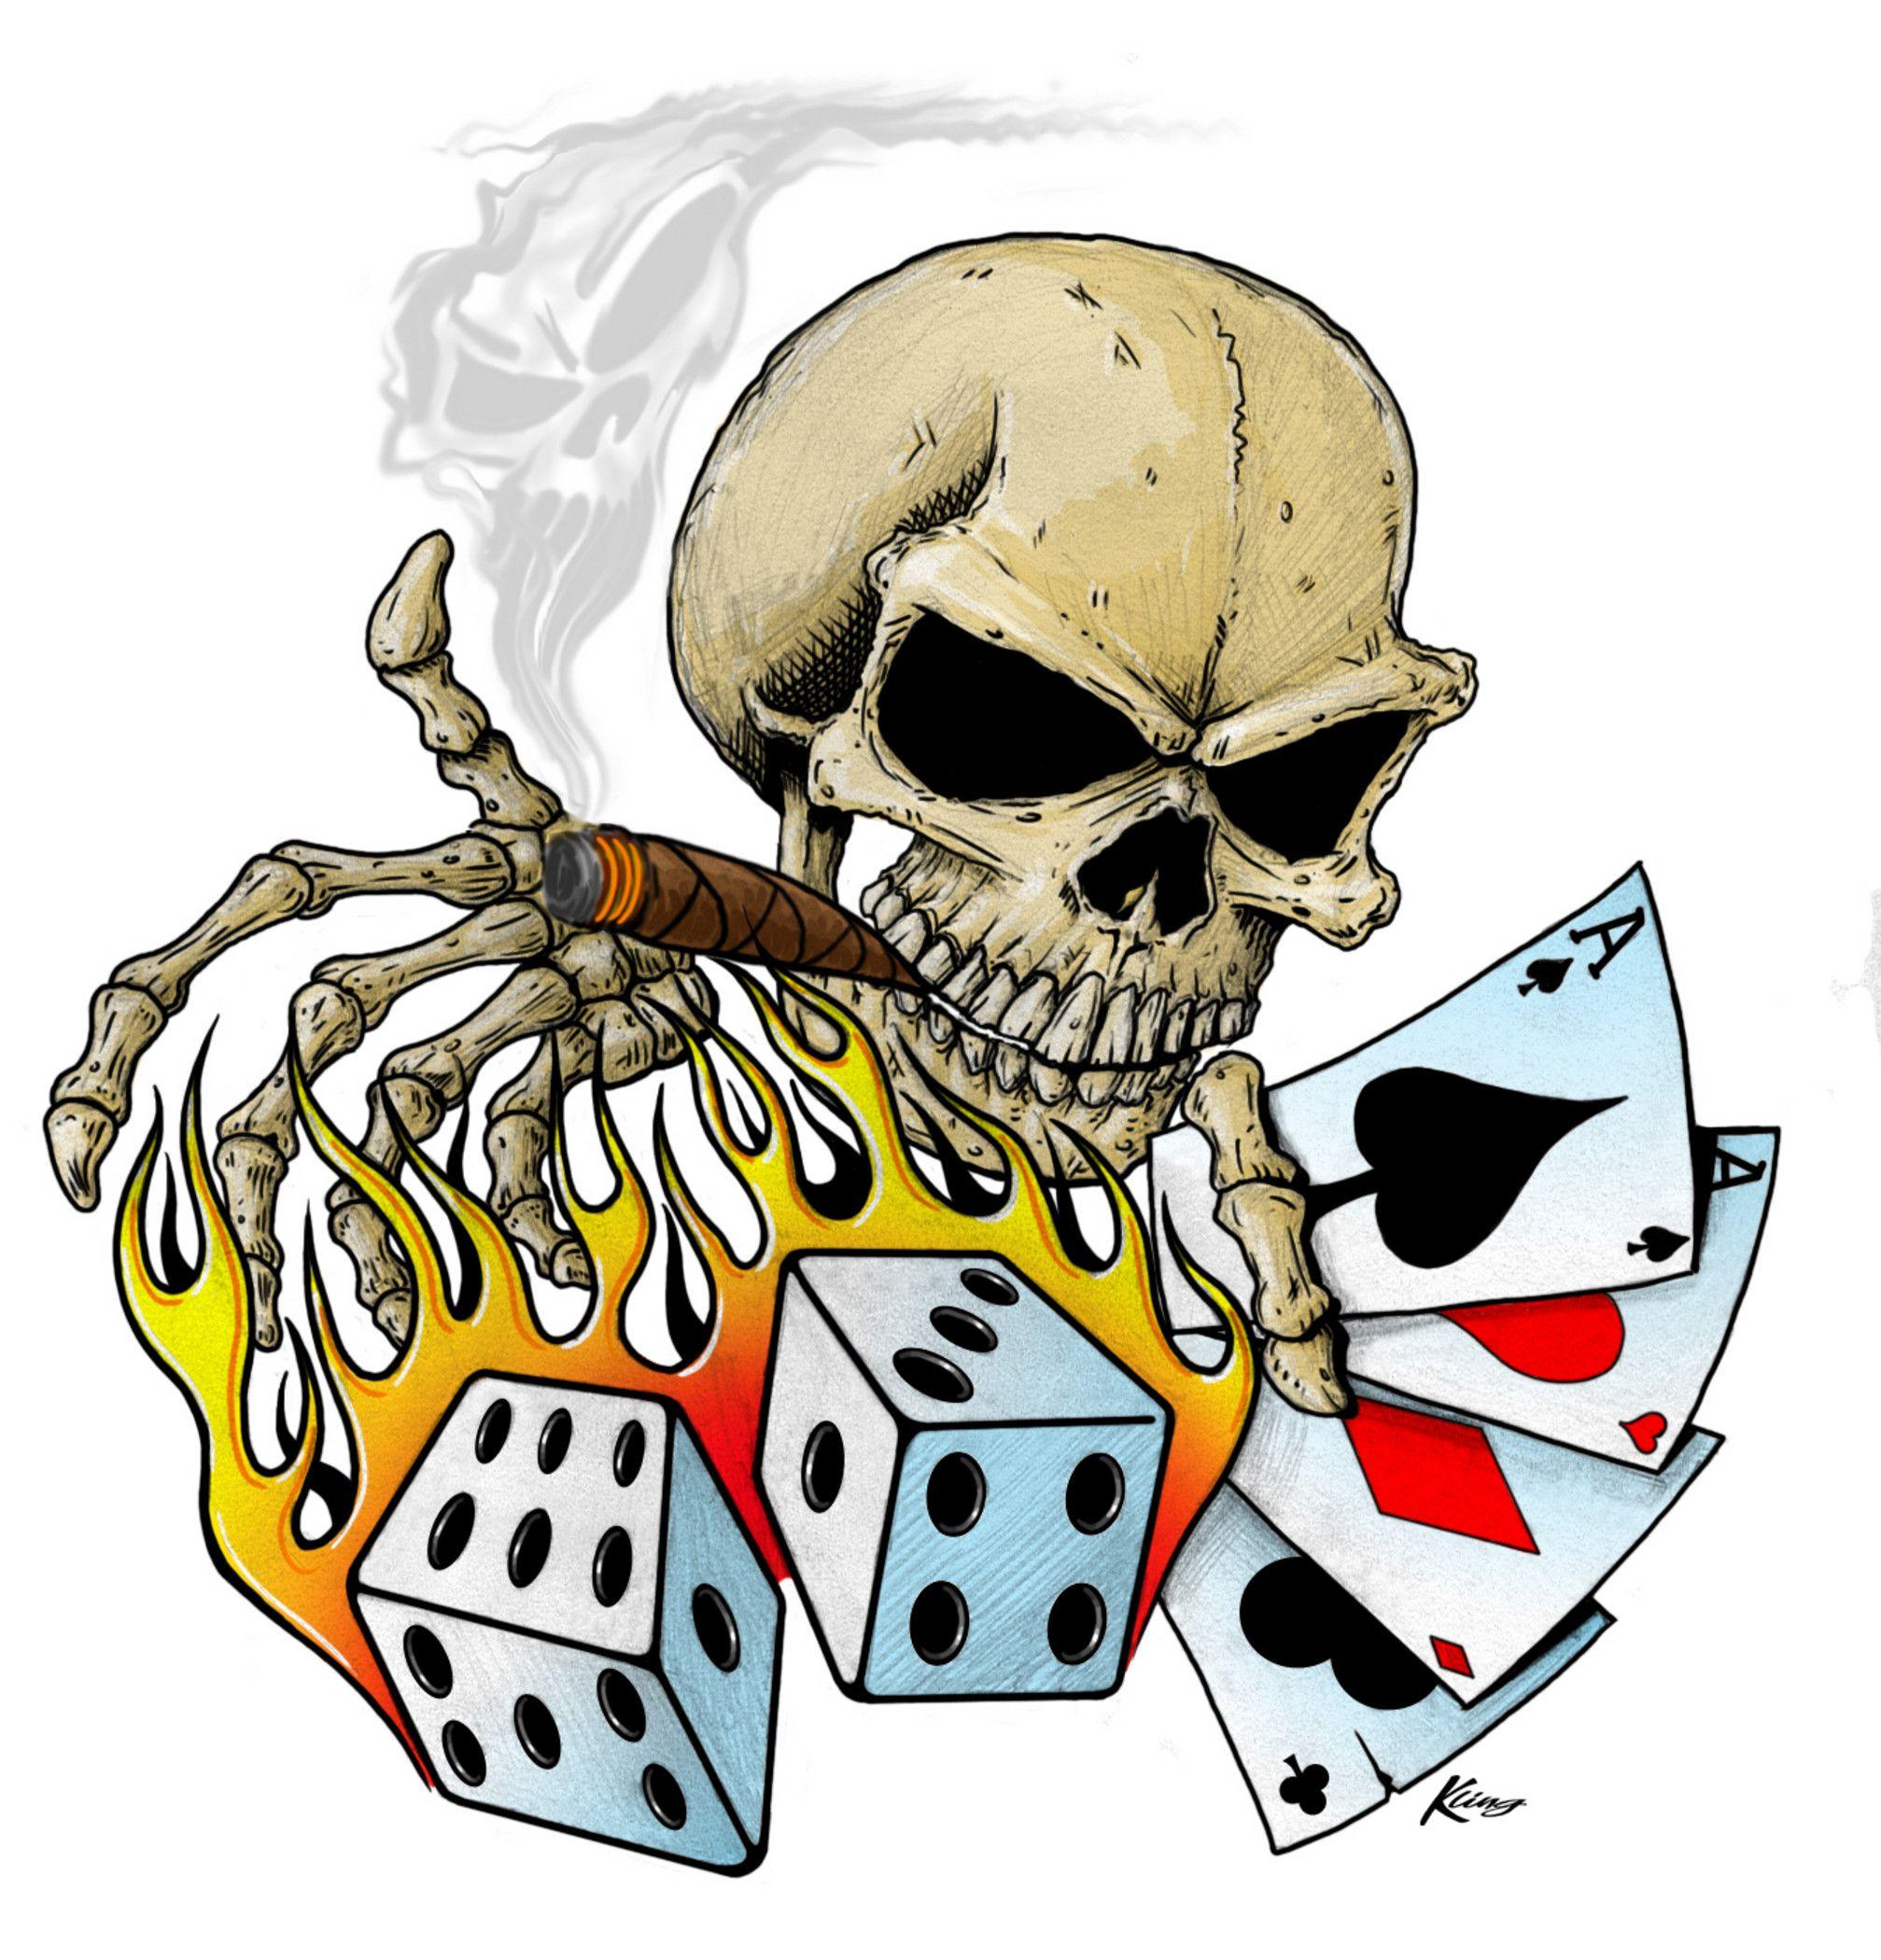 Simple skull tattoo designs - Cool Skull Tattoo Designs Cool Skull Tattoo Designs Cool Skull Tattoo Designs 34